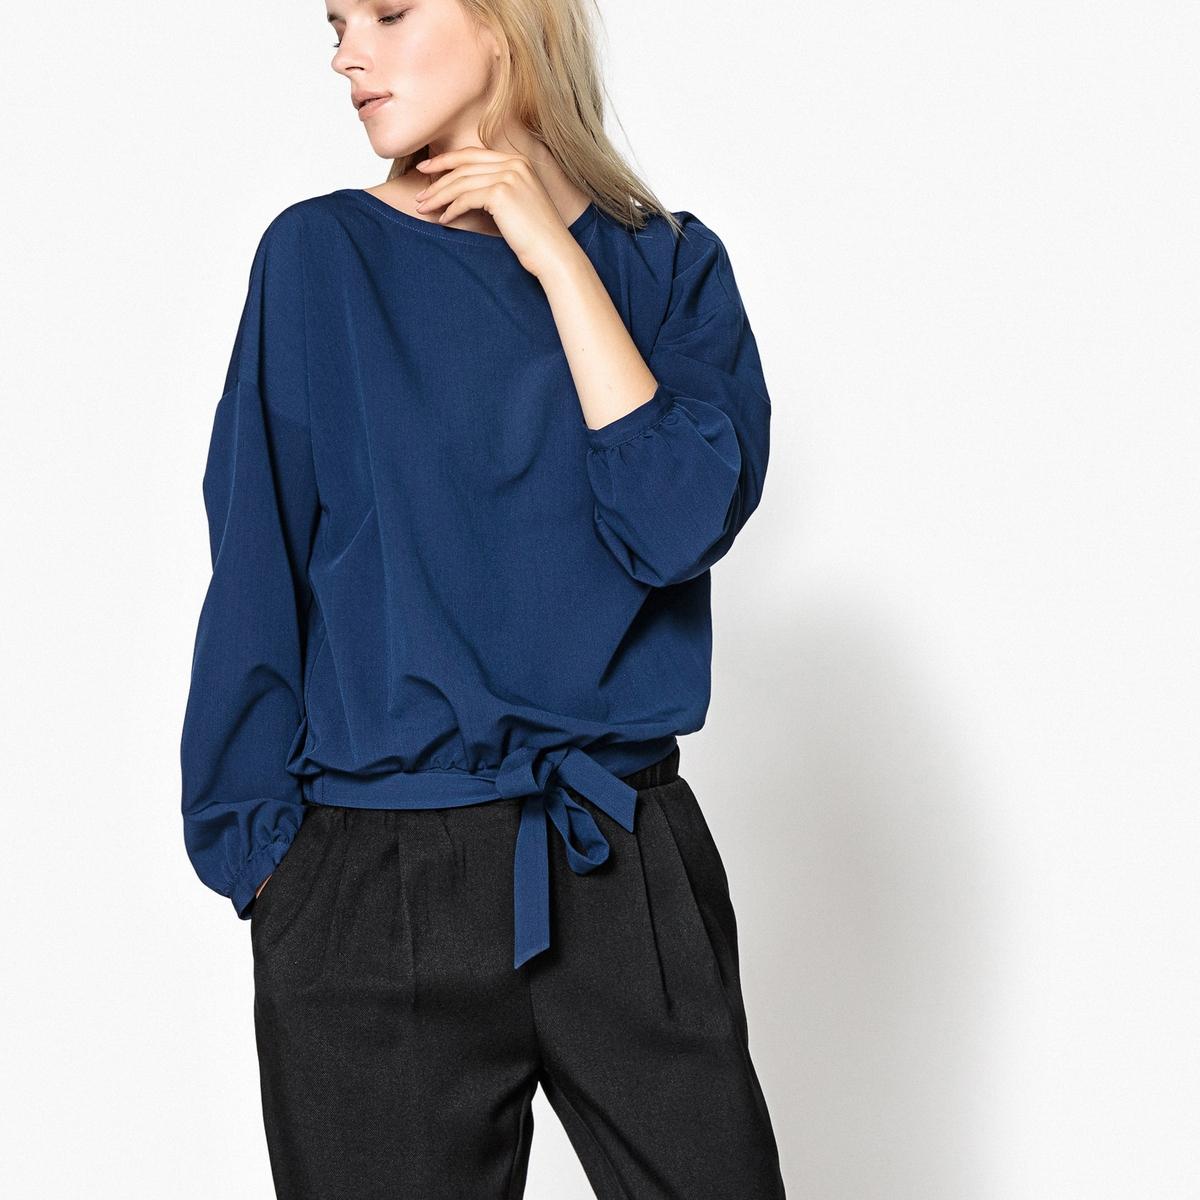 Блузка с напускными рукавами и завязкой снизу